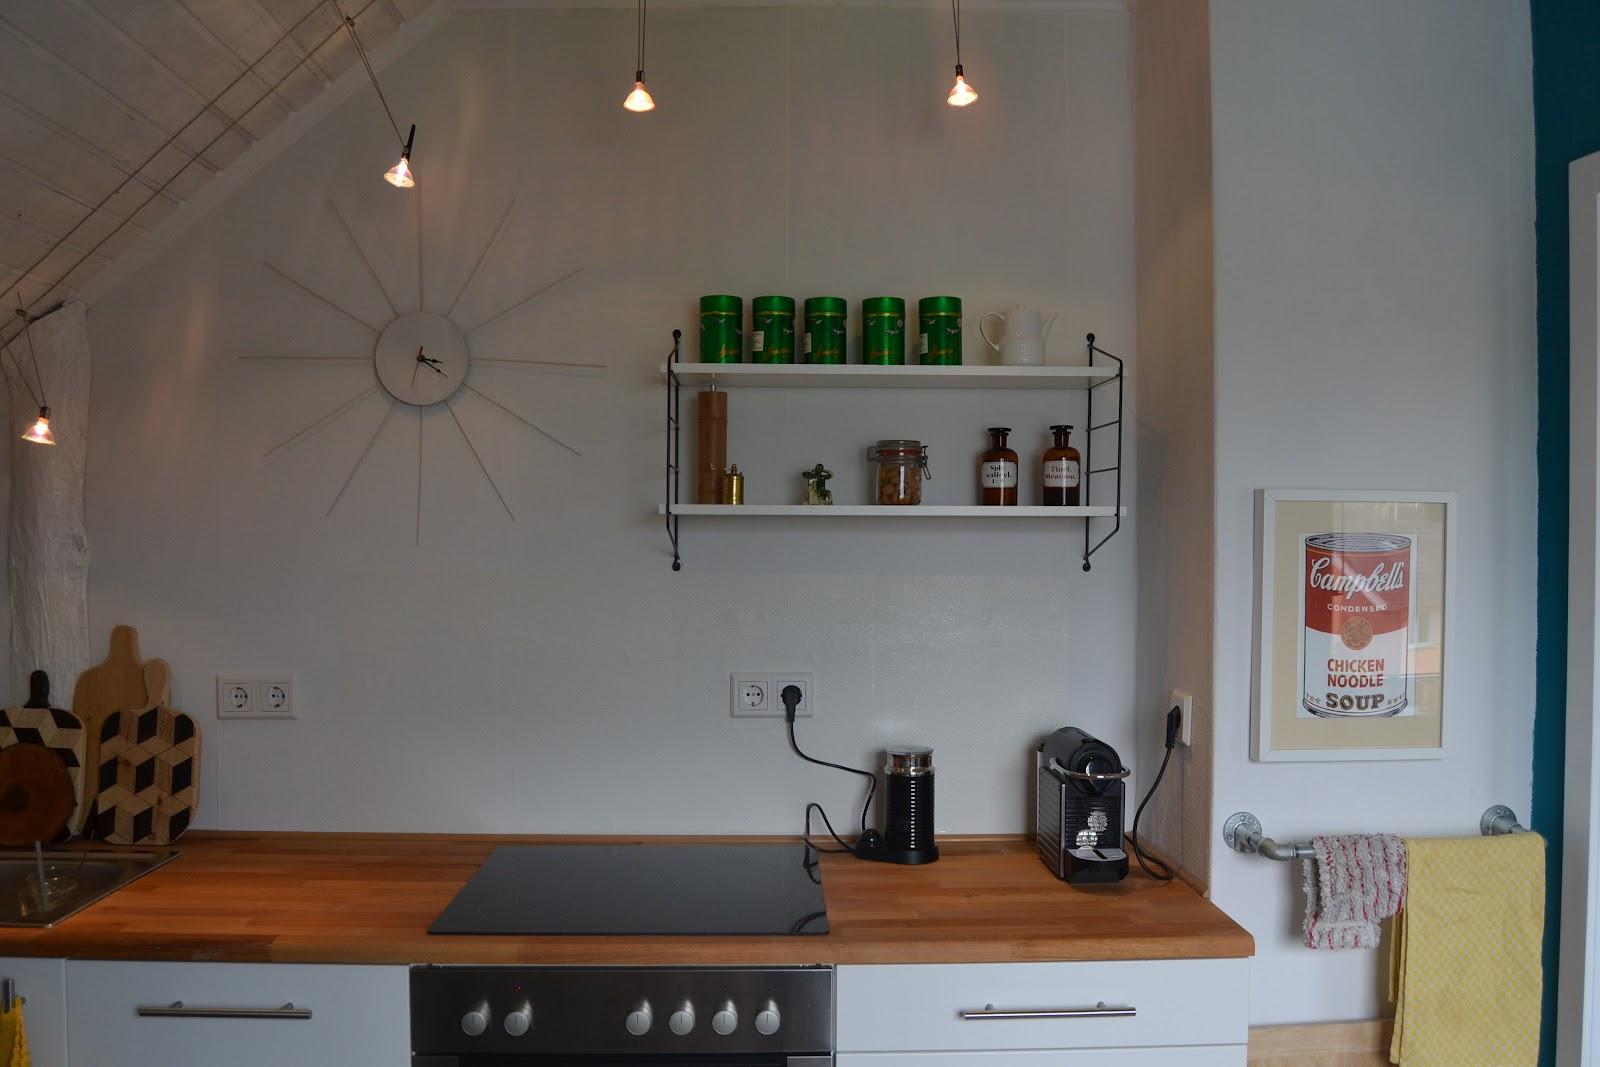 traedraum juni 2012. Black Bedroom Furniture Sets. Home Design Ideas